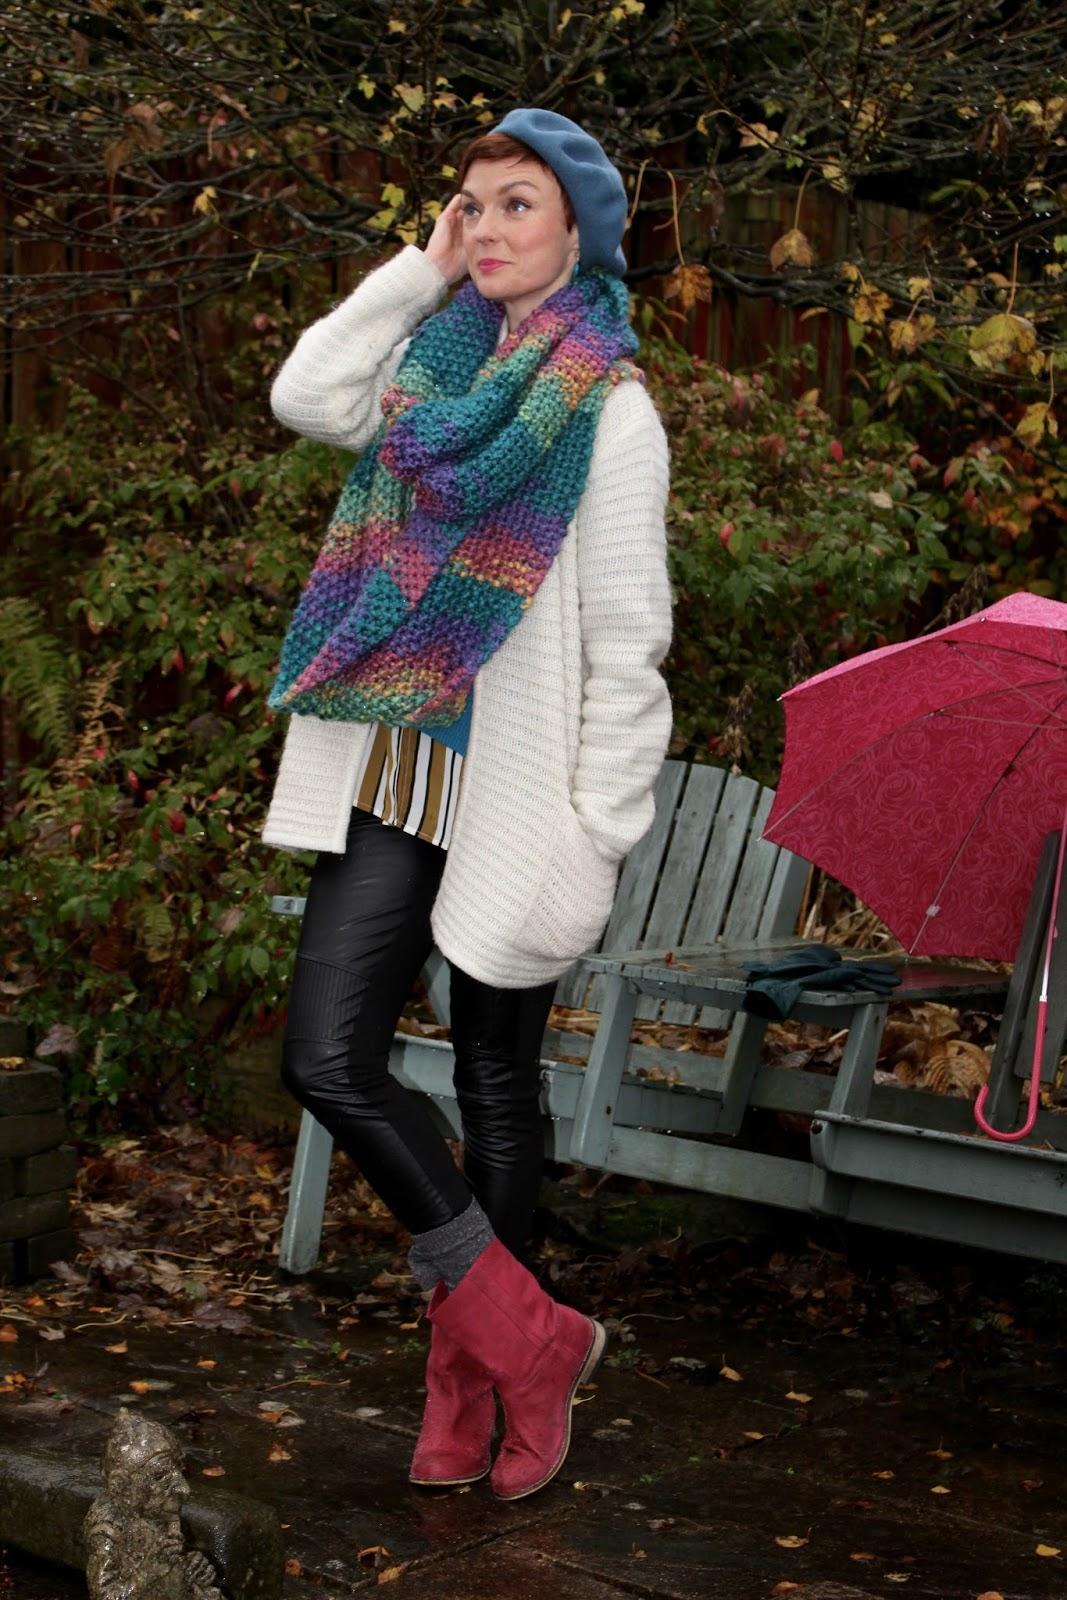 Layering knits in Autumn / winter | Fake fabulous